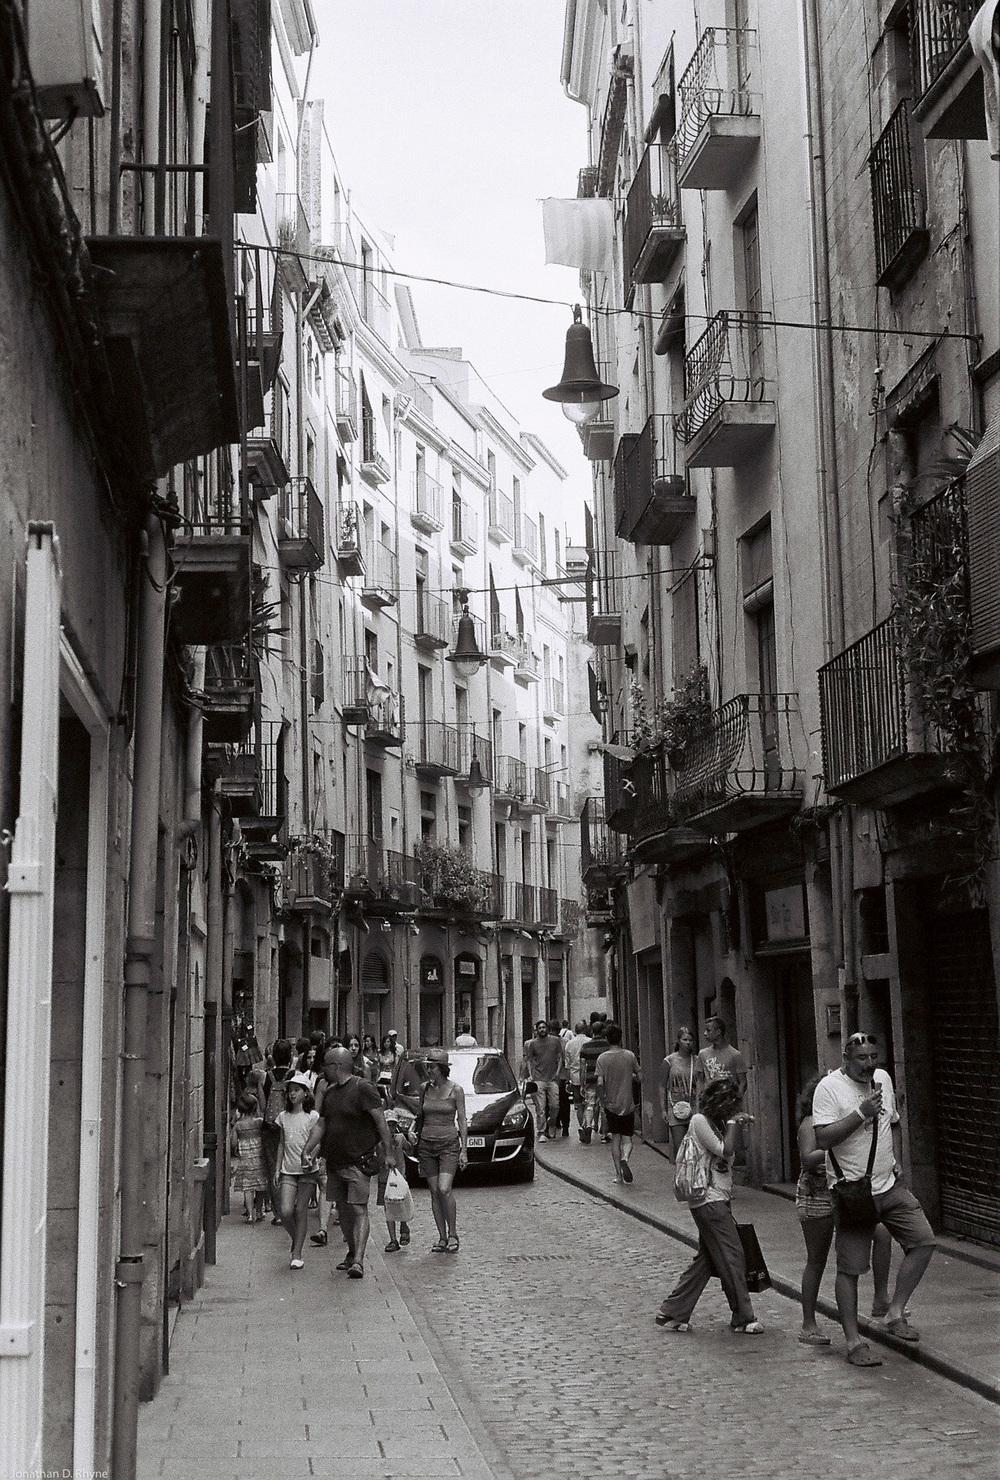 Streets of Girona. Girona, Catalonia - Leica M3 Afga APX 400